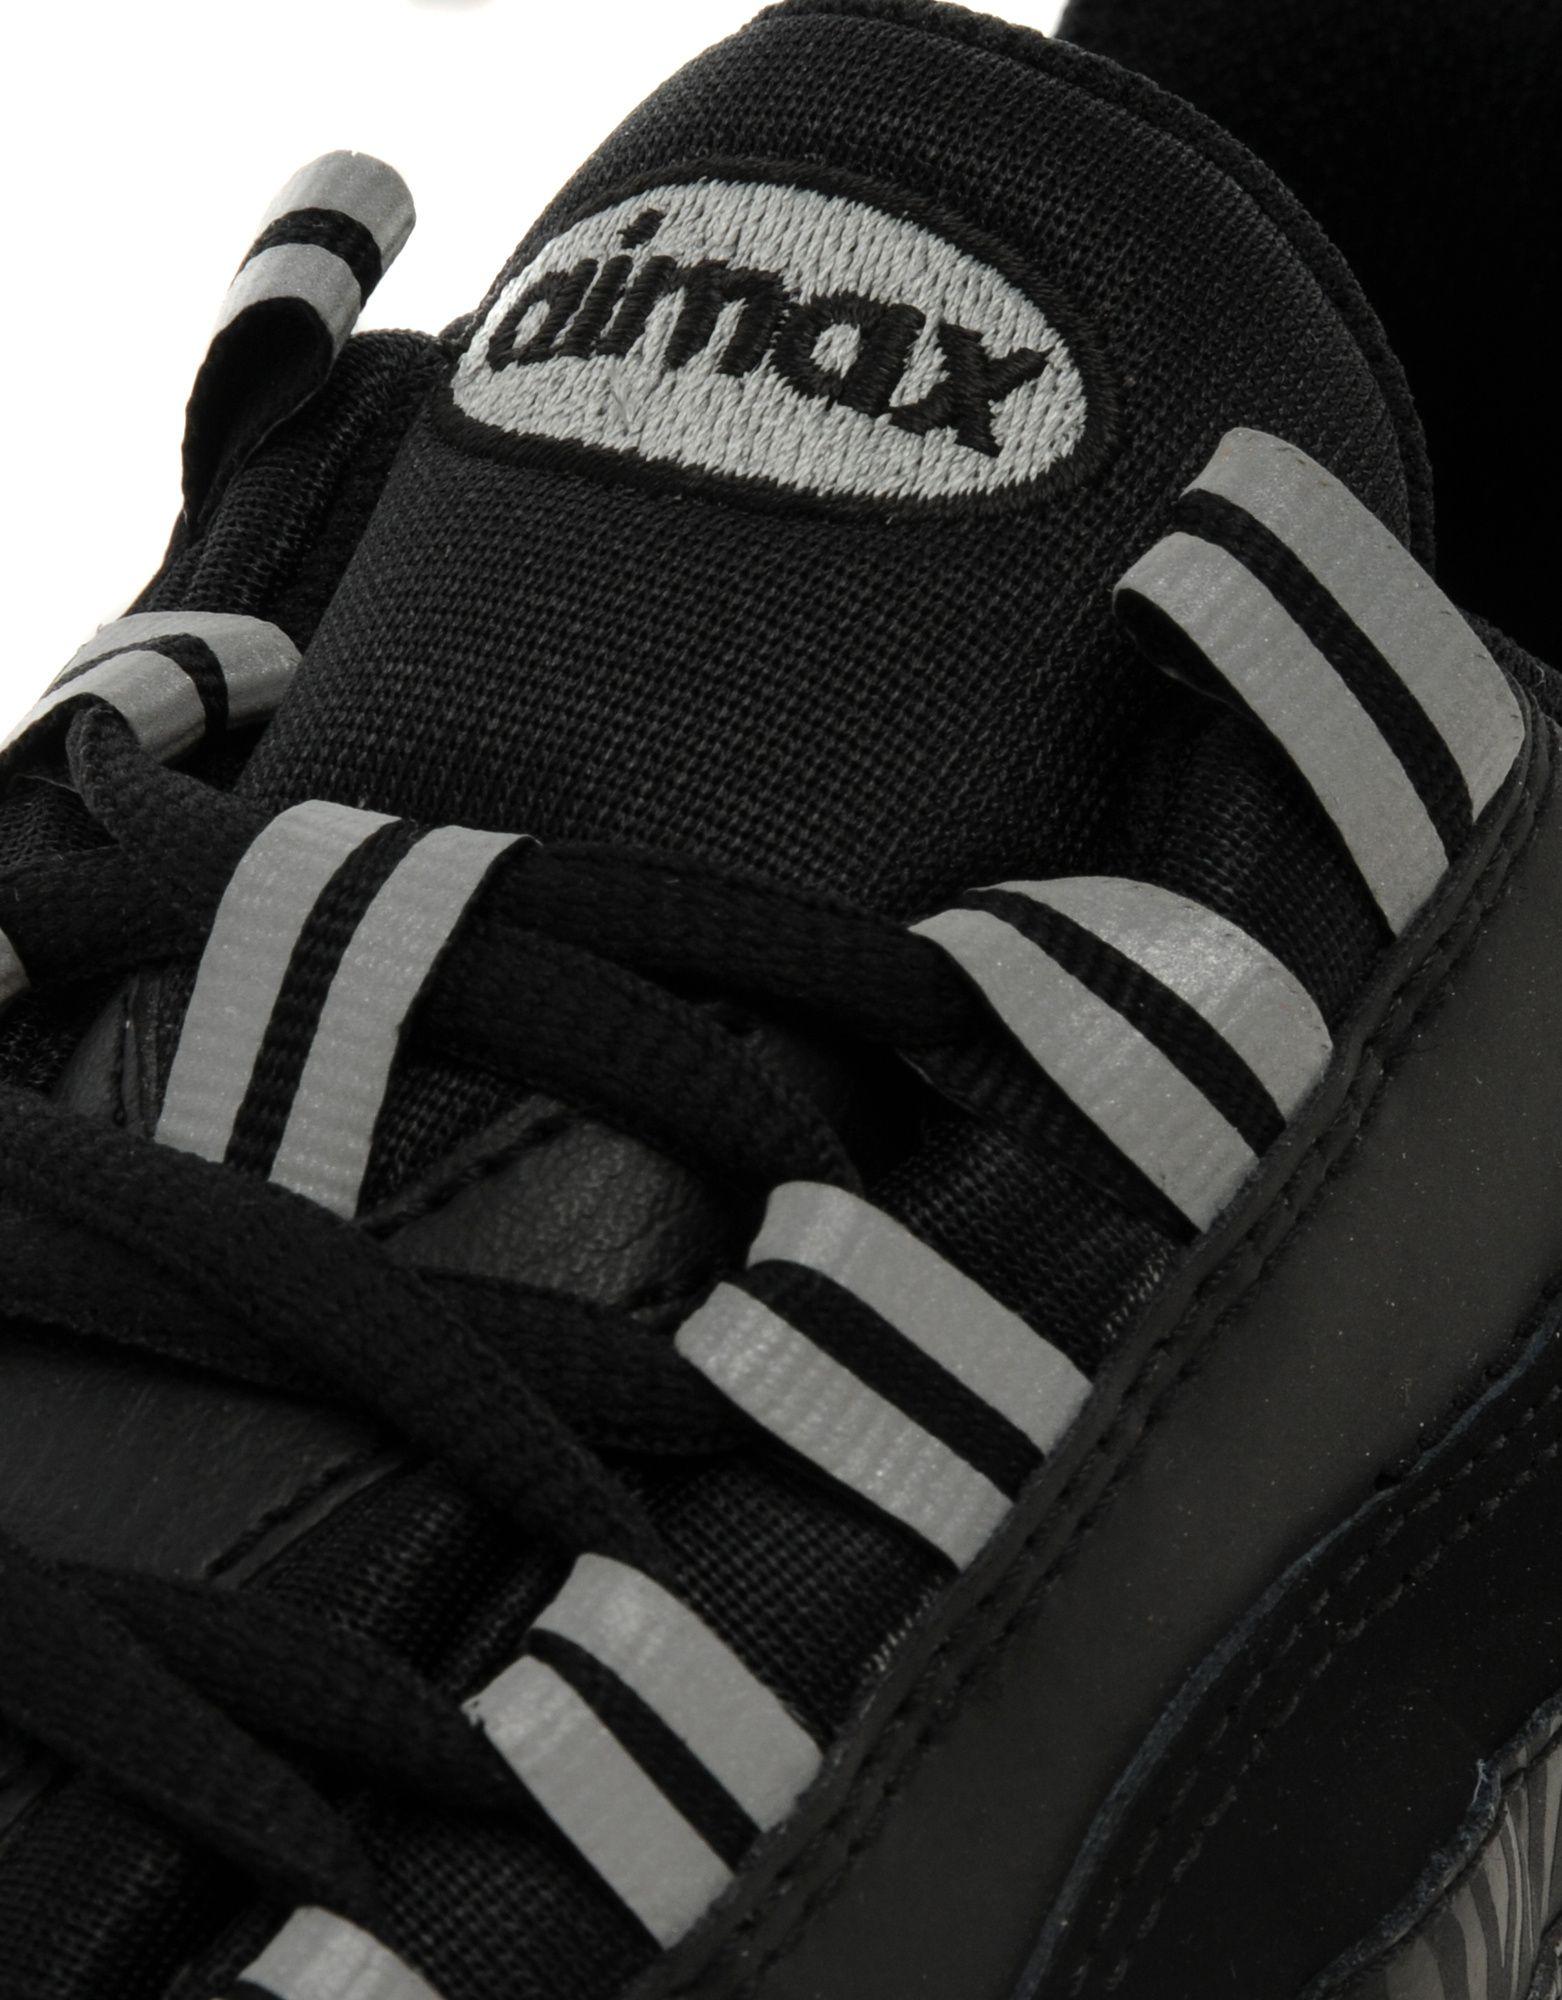 Nike Air Max 95 Junior 'Reflective Pack'